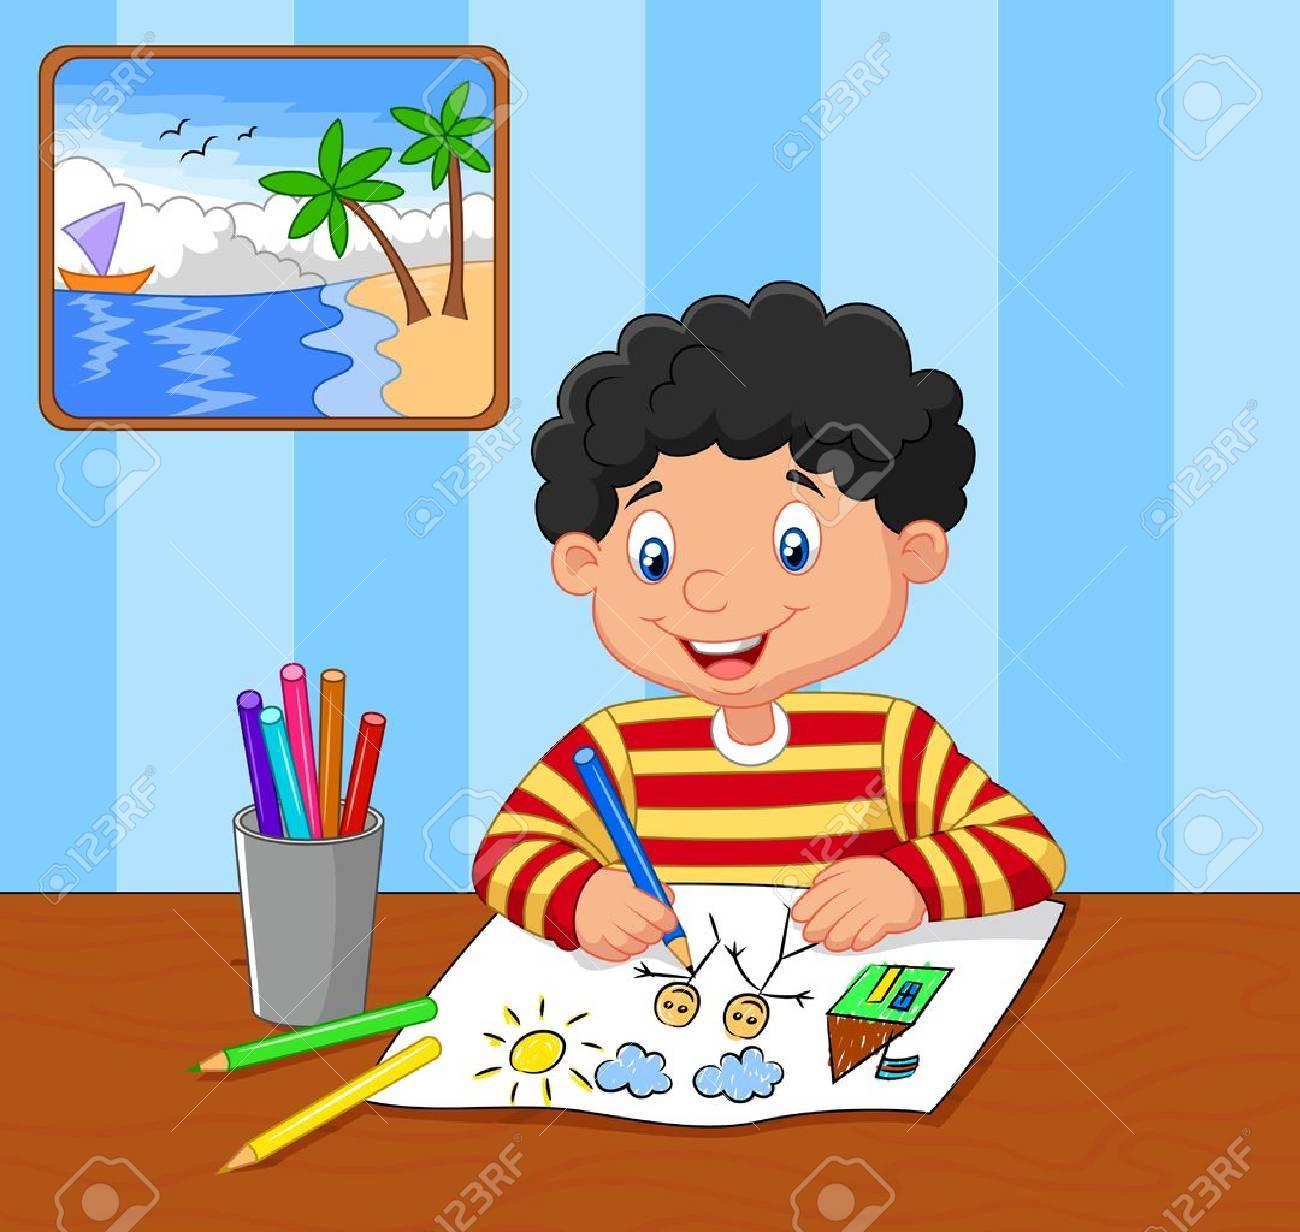 1300x1232 Cartoon Little Boy Drawing Royalty Free Cliparts, Vectors,